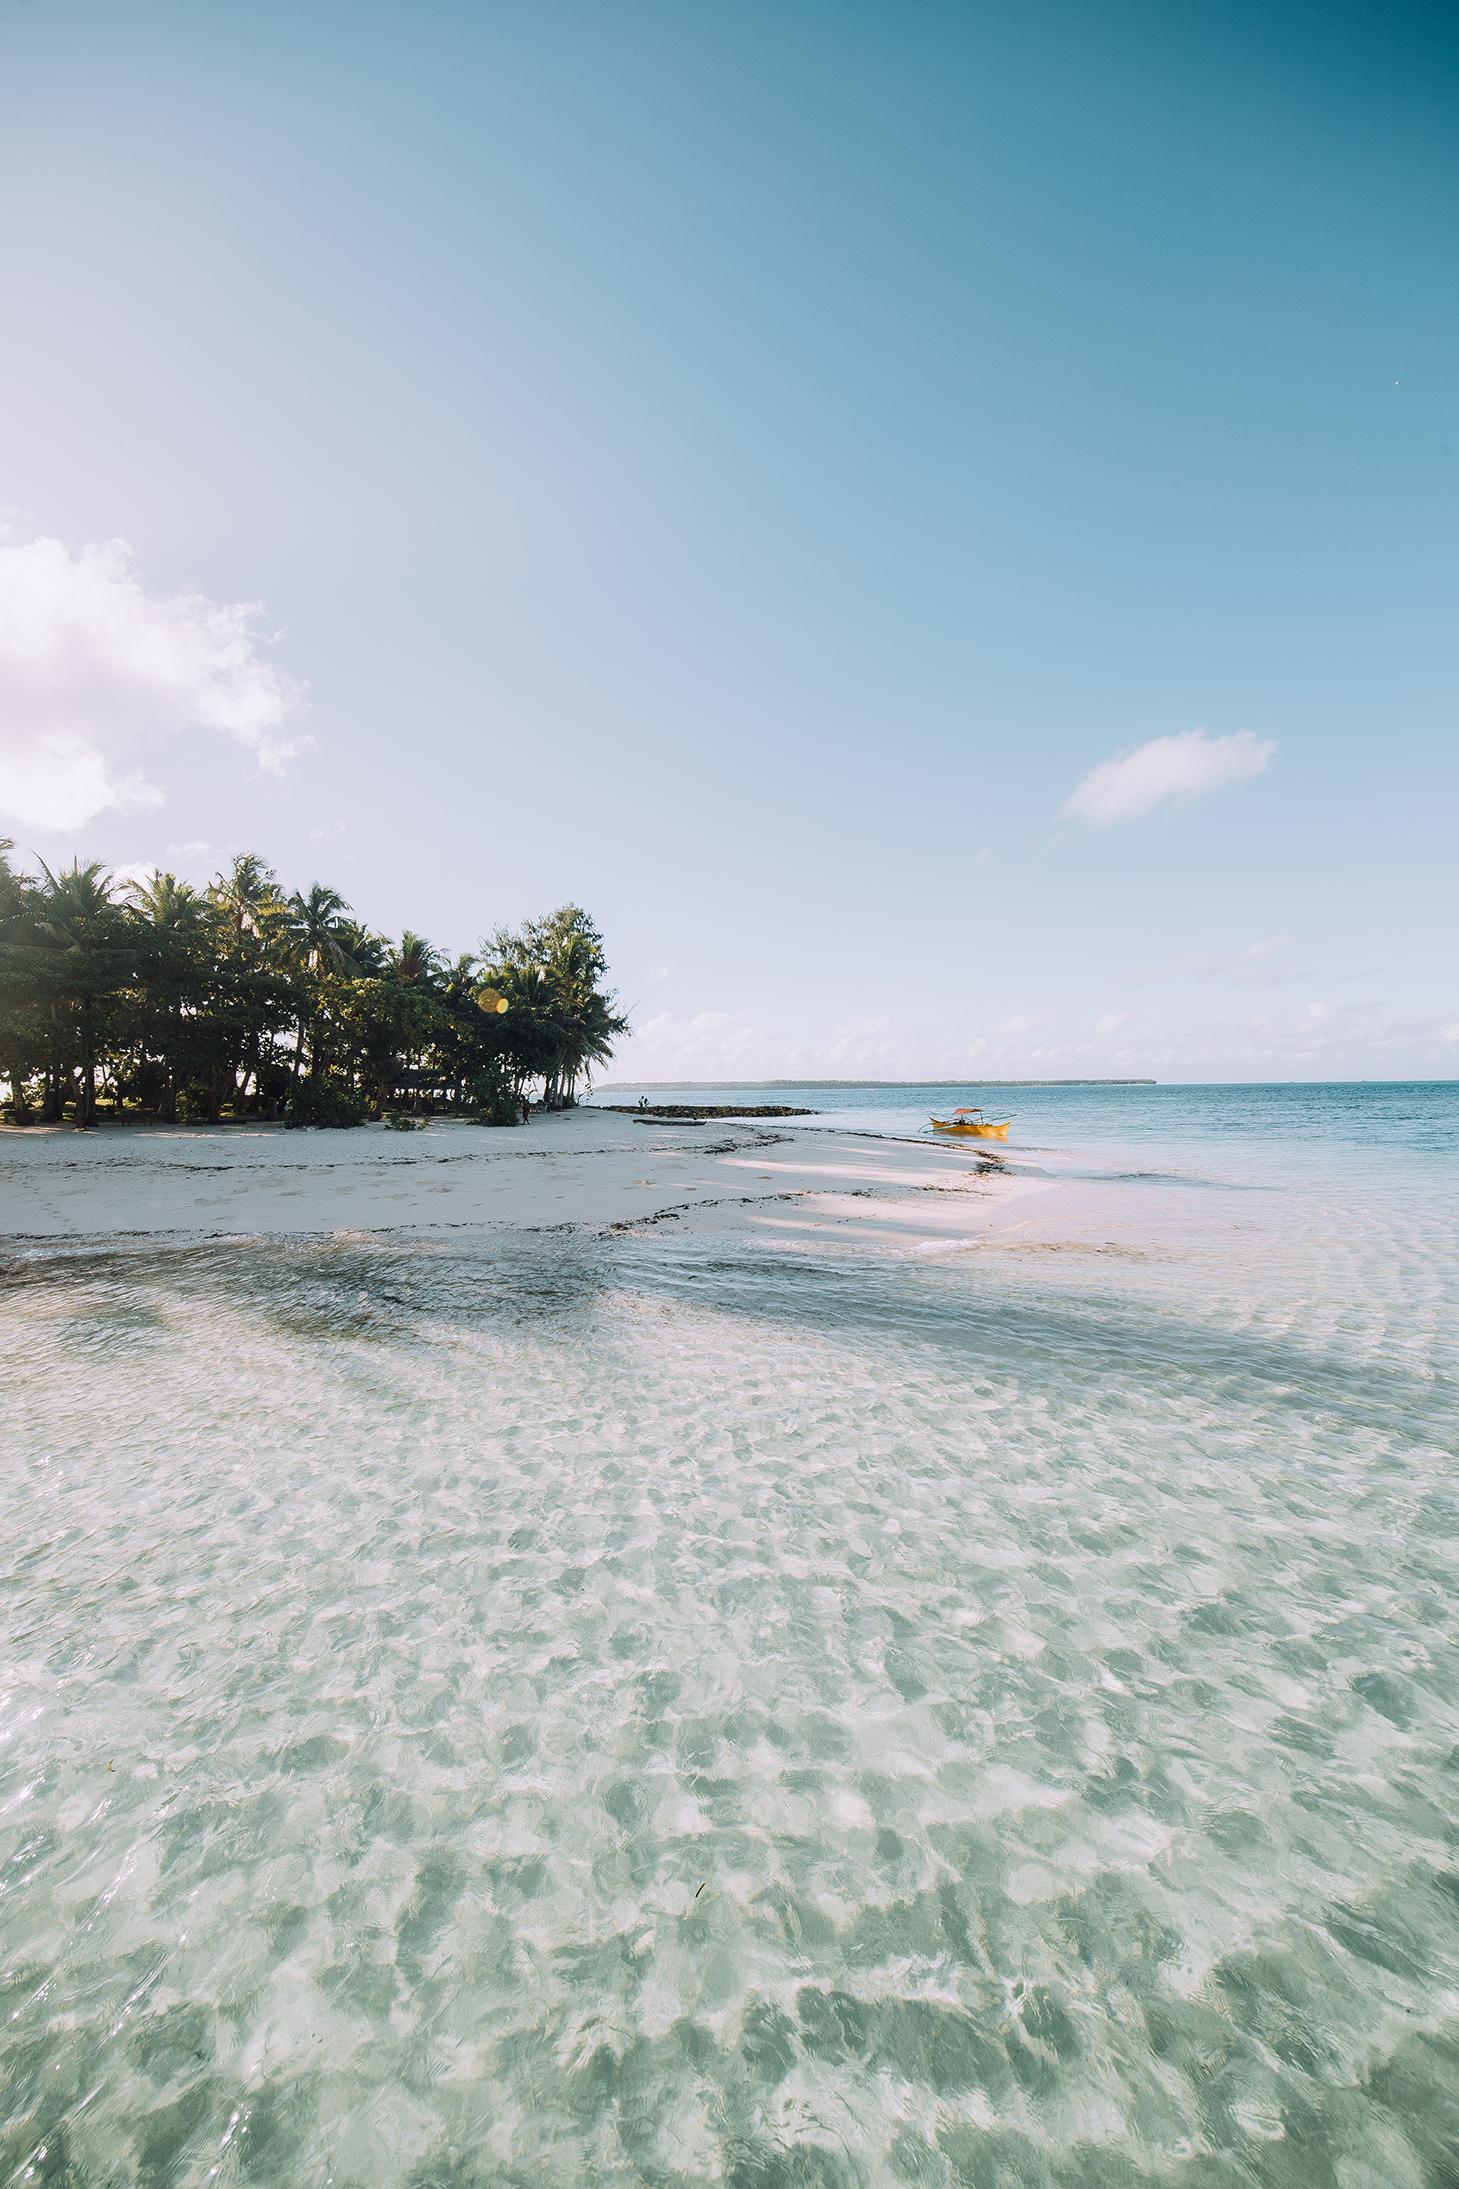 Philippines_DOT_Siagrao-4278